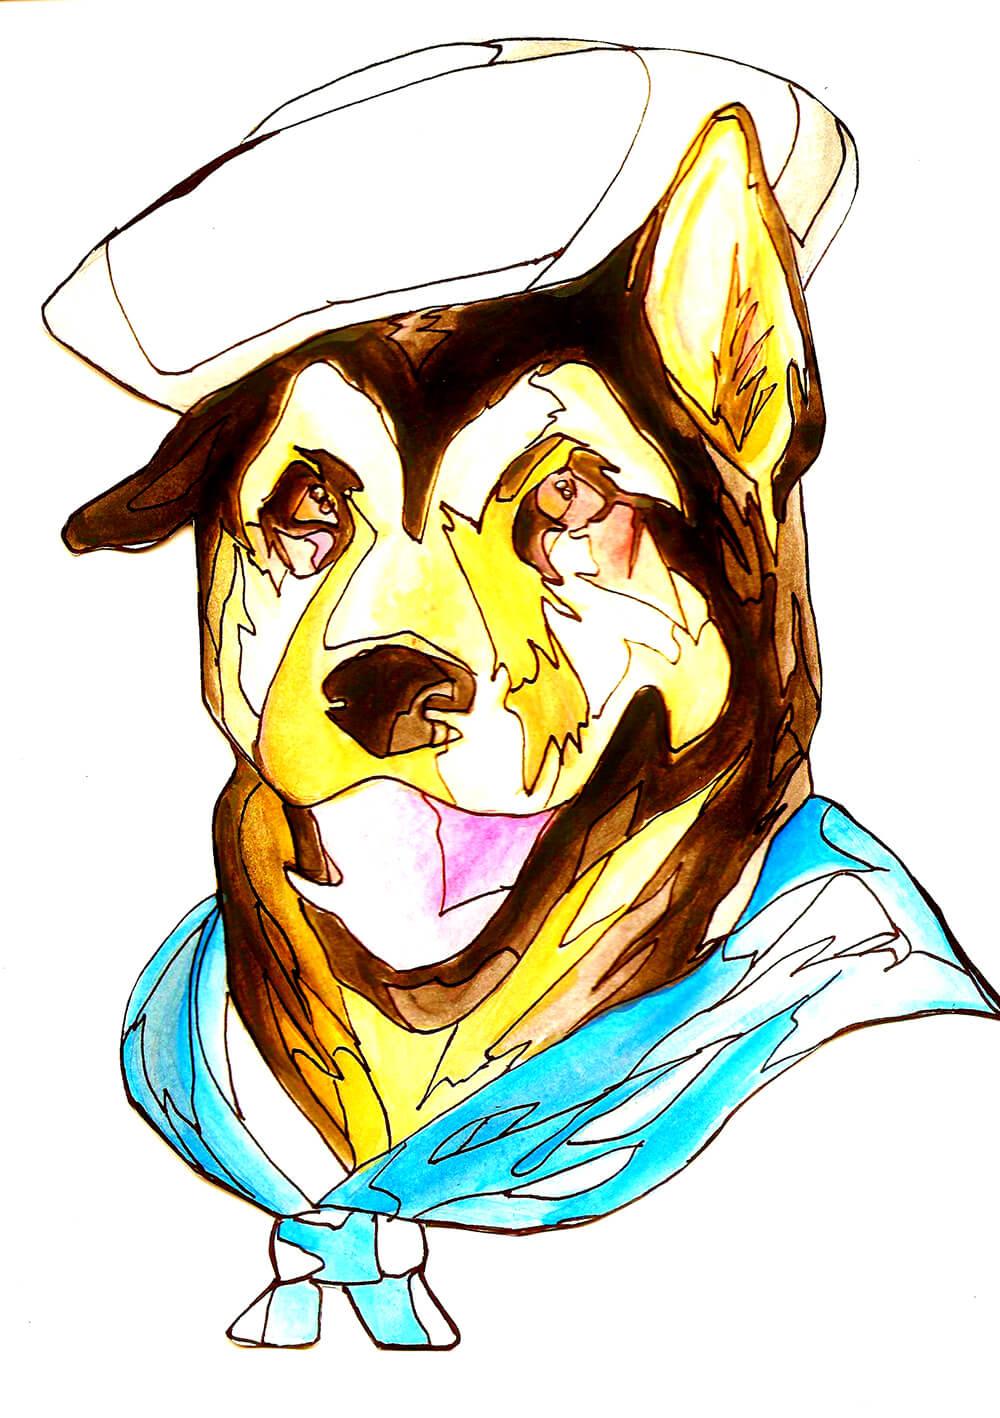 One Salty Seadog! Medium: Watercolor and Sharpie Marker